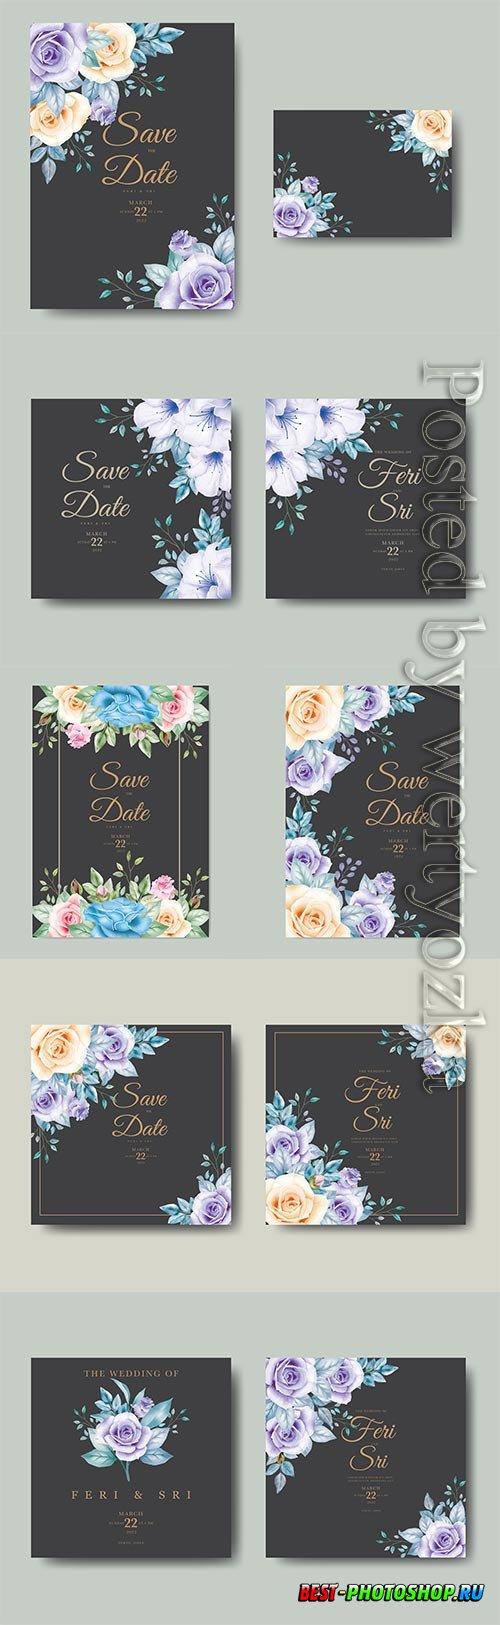 Wedding invitation card with floral watercolor vector design